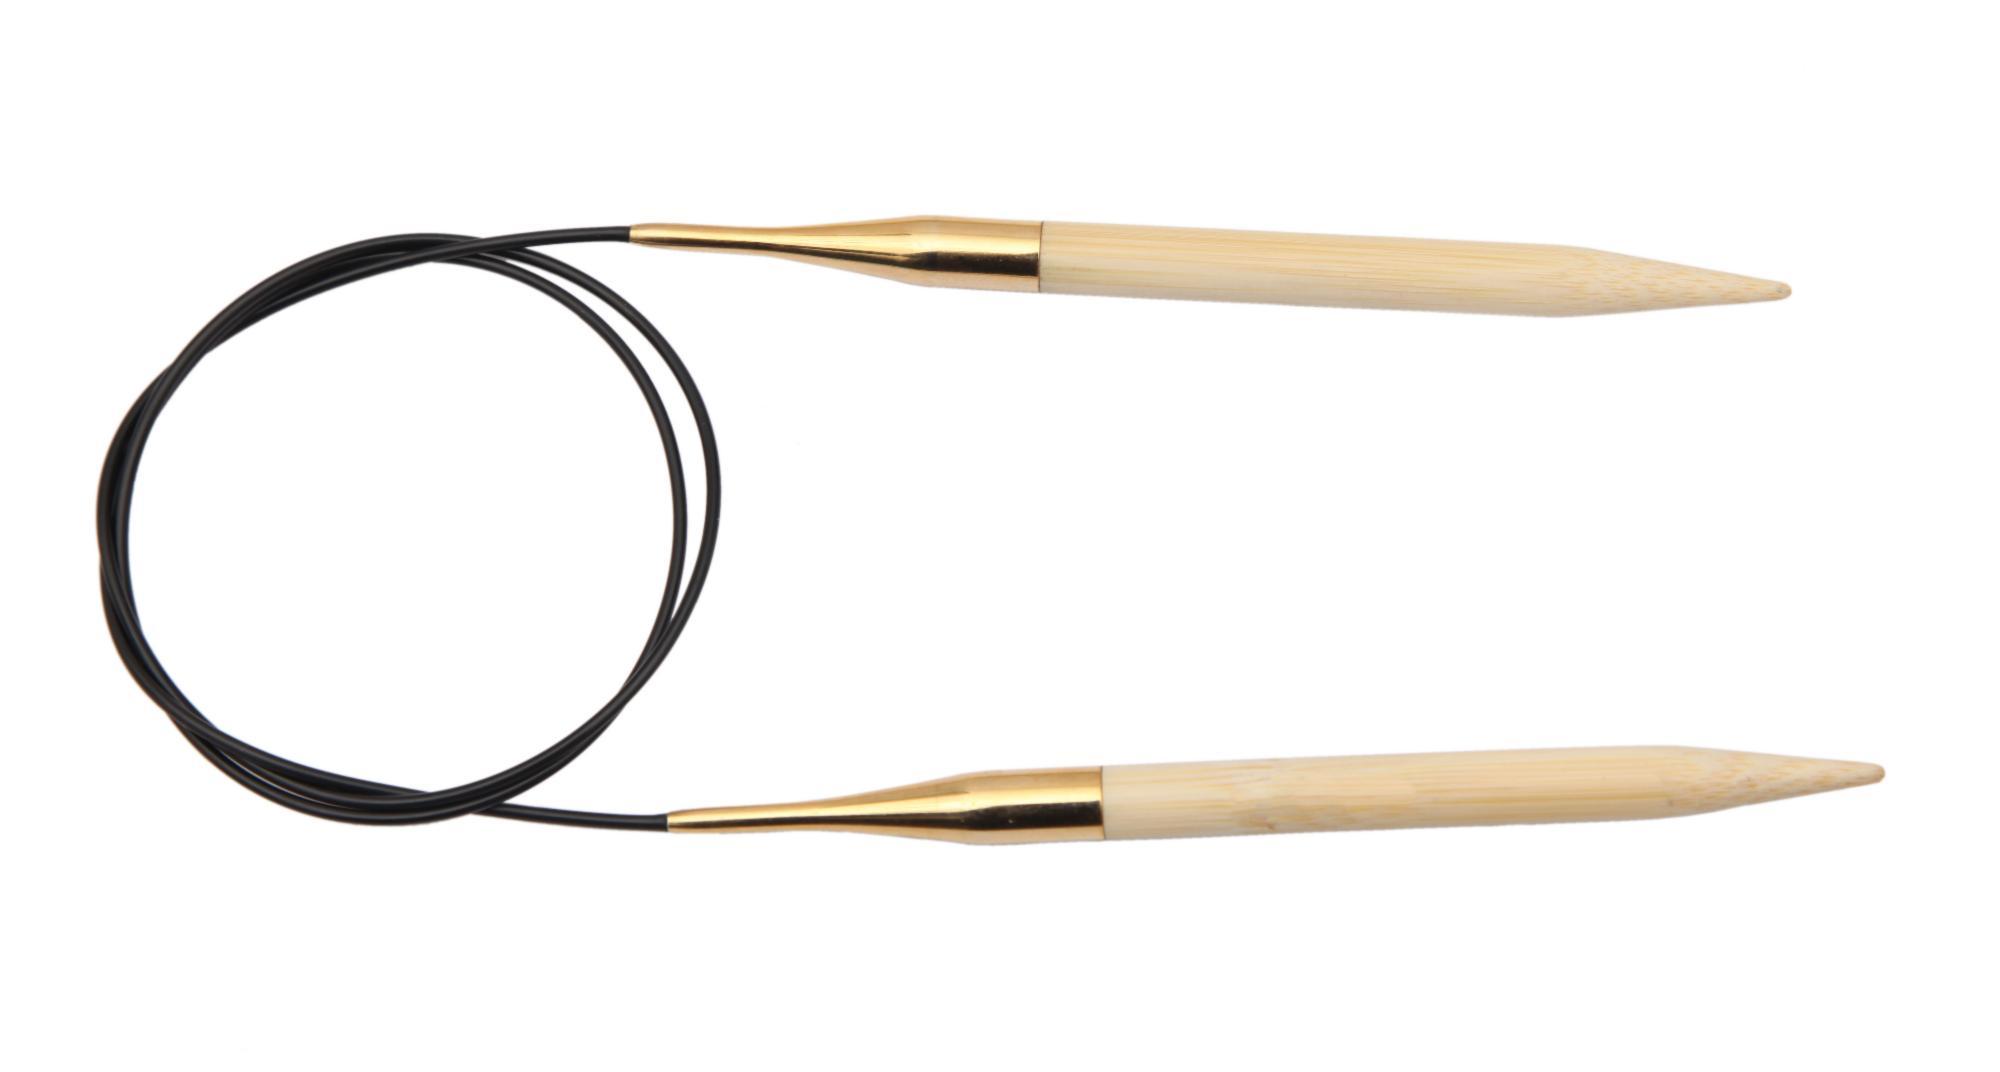 Спицы круговые 60 см Bamboo KnitPro, 22227, 4.00 мм